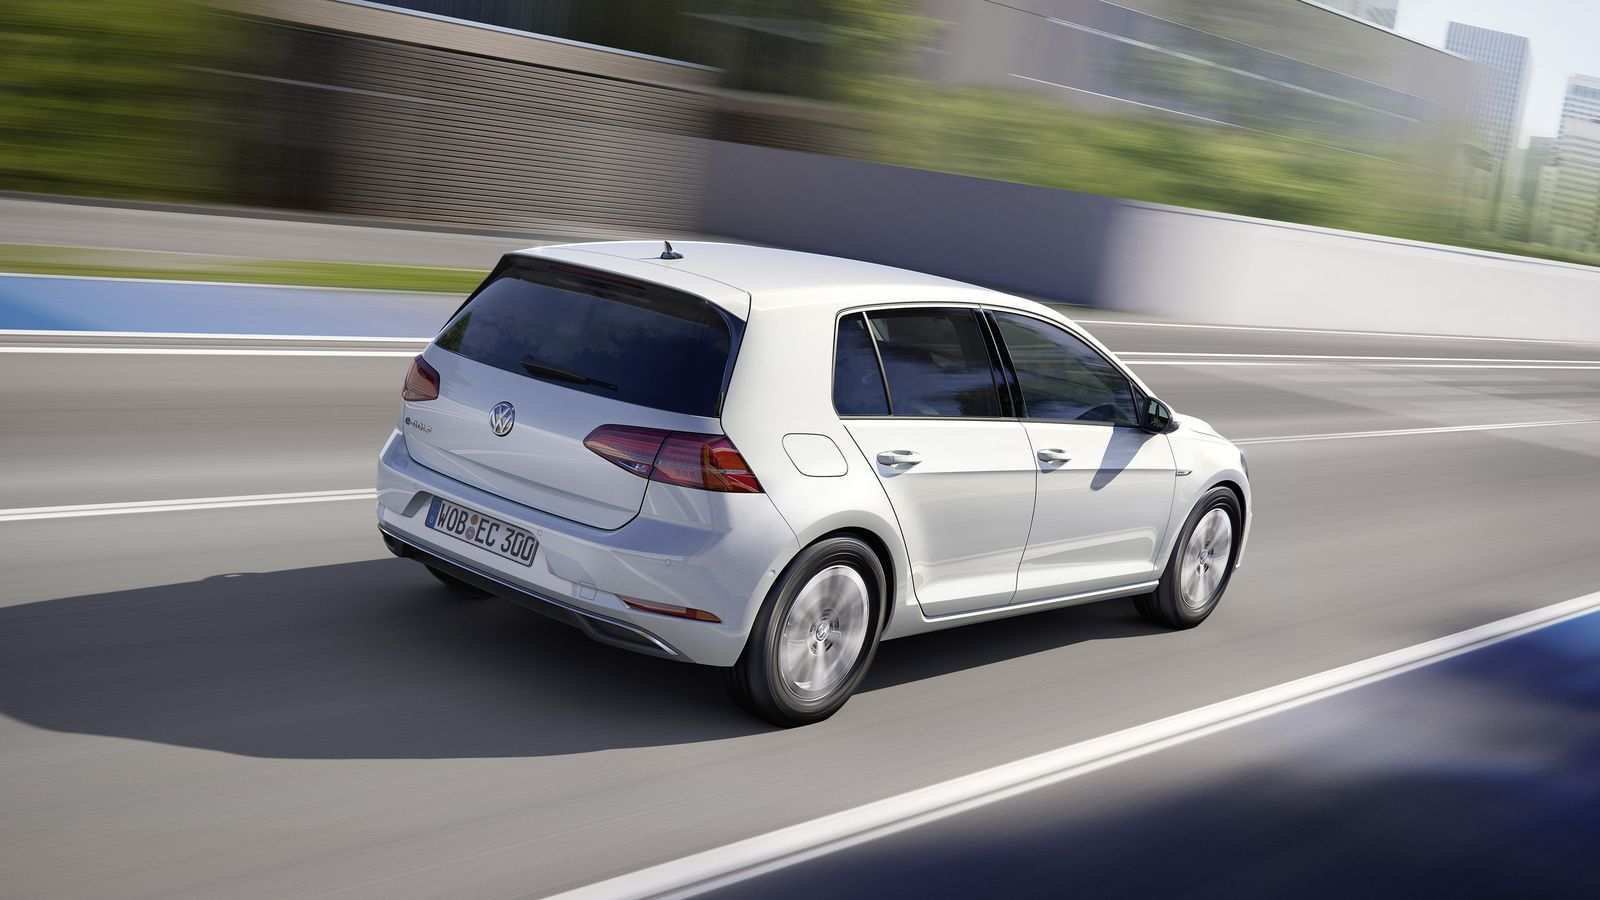 36 Best Review The Volkswagen E Up 2019 Rumor New Review with The Volkswagen E Up 2019 Rumor